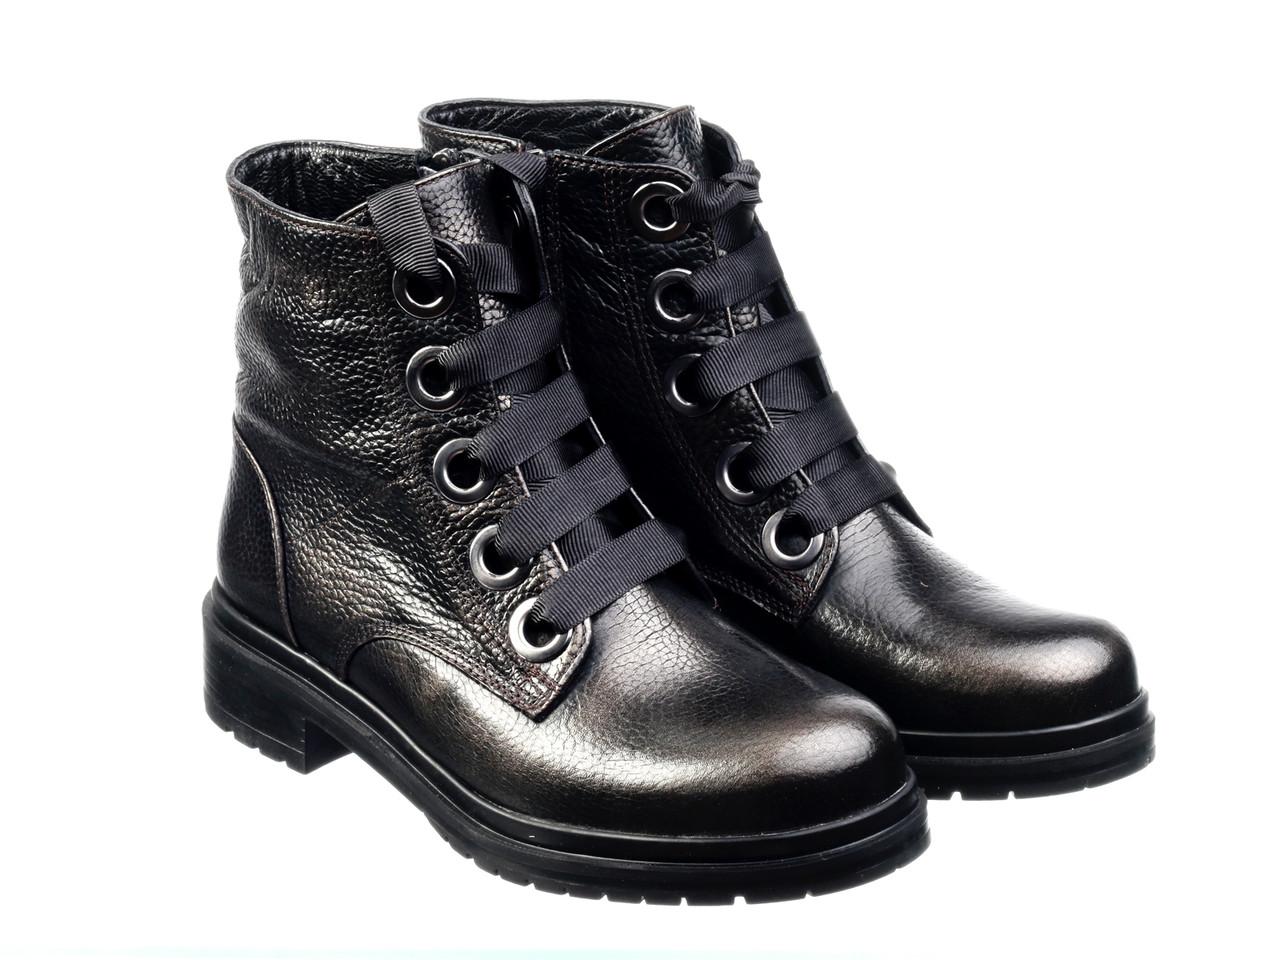 Ботинки Etor 6594-7211 бронза